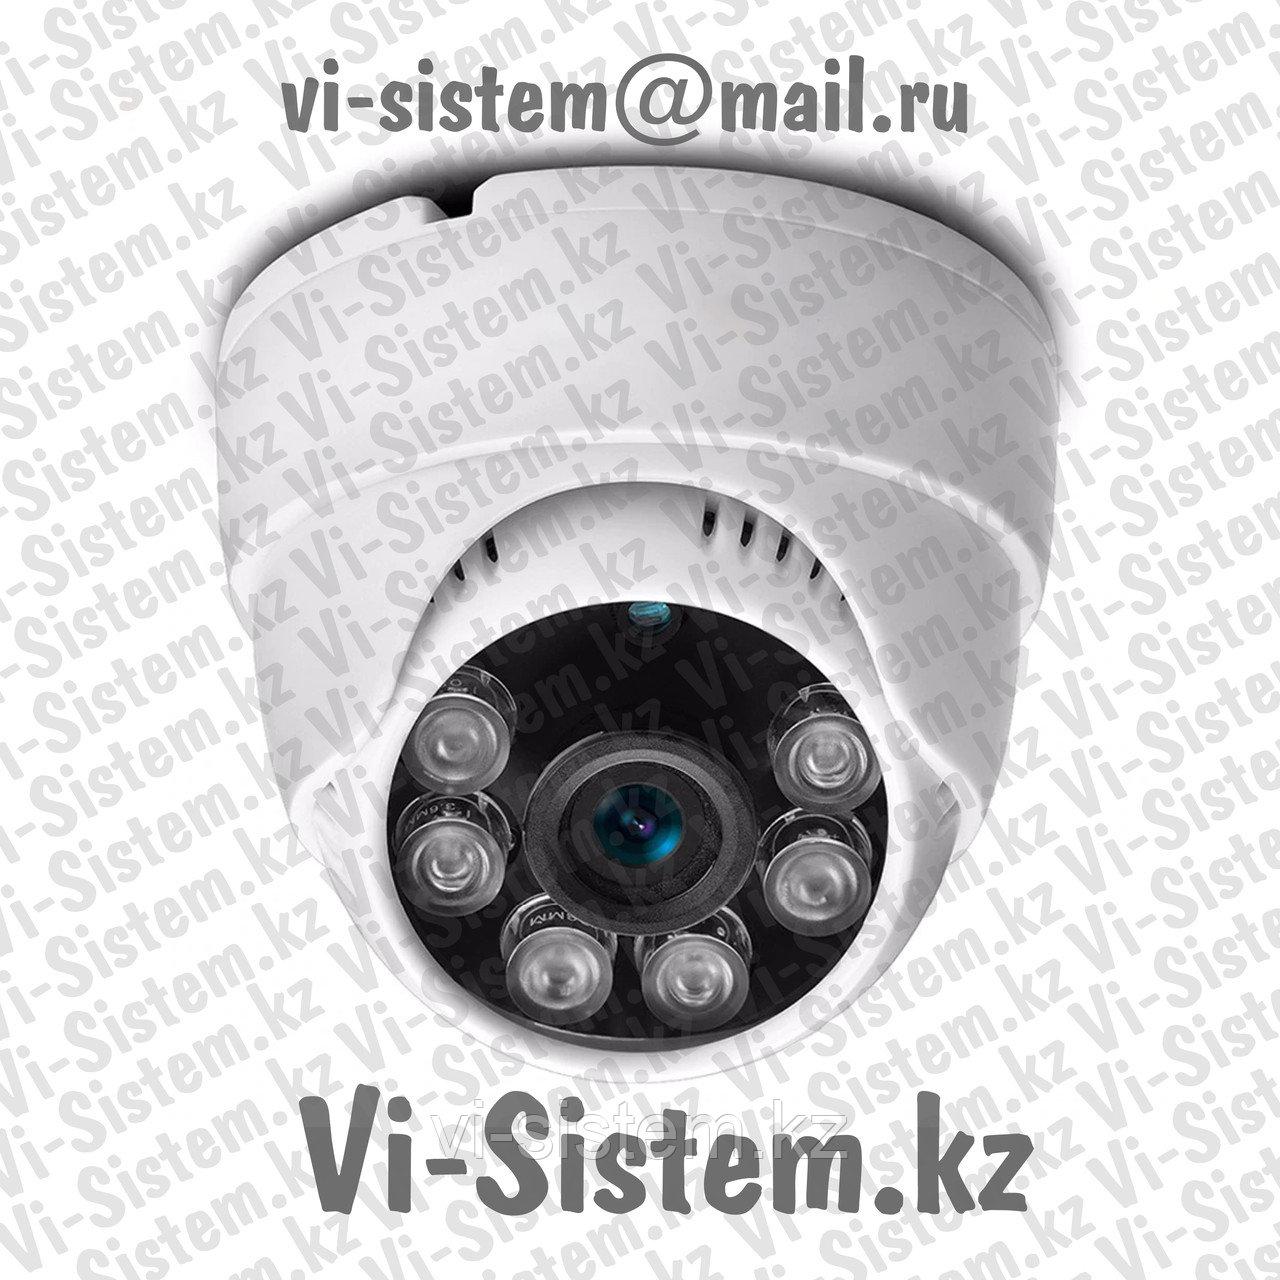 IP-Видеокамера SYNQAR IP-511 5MP